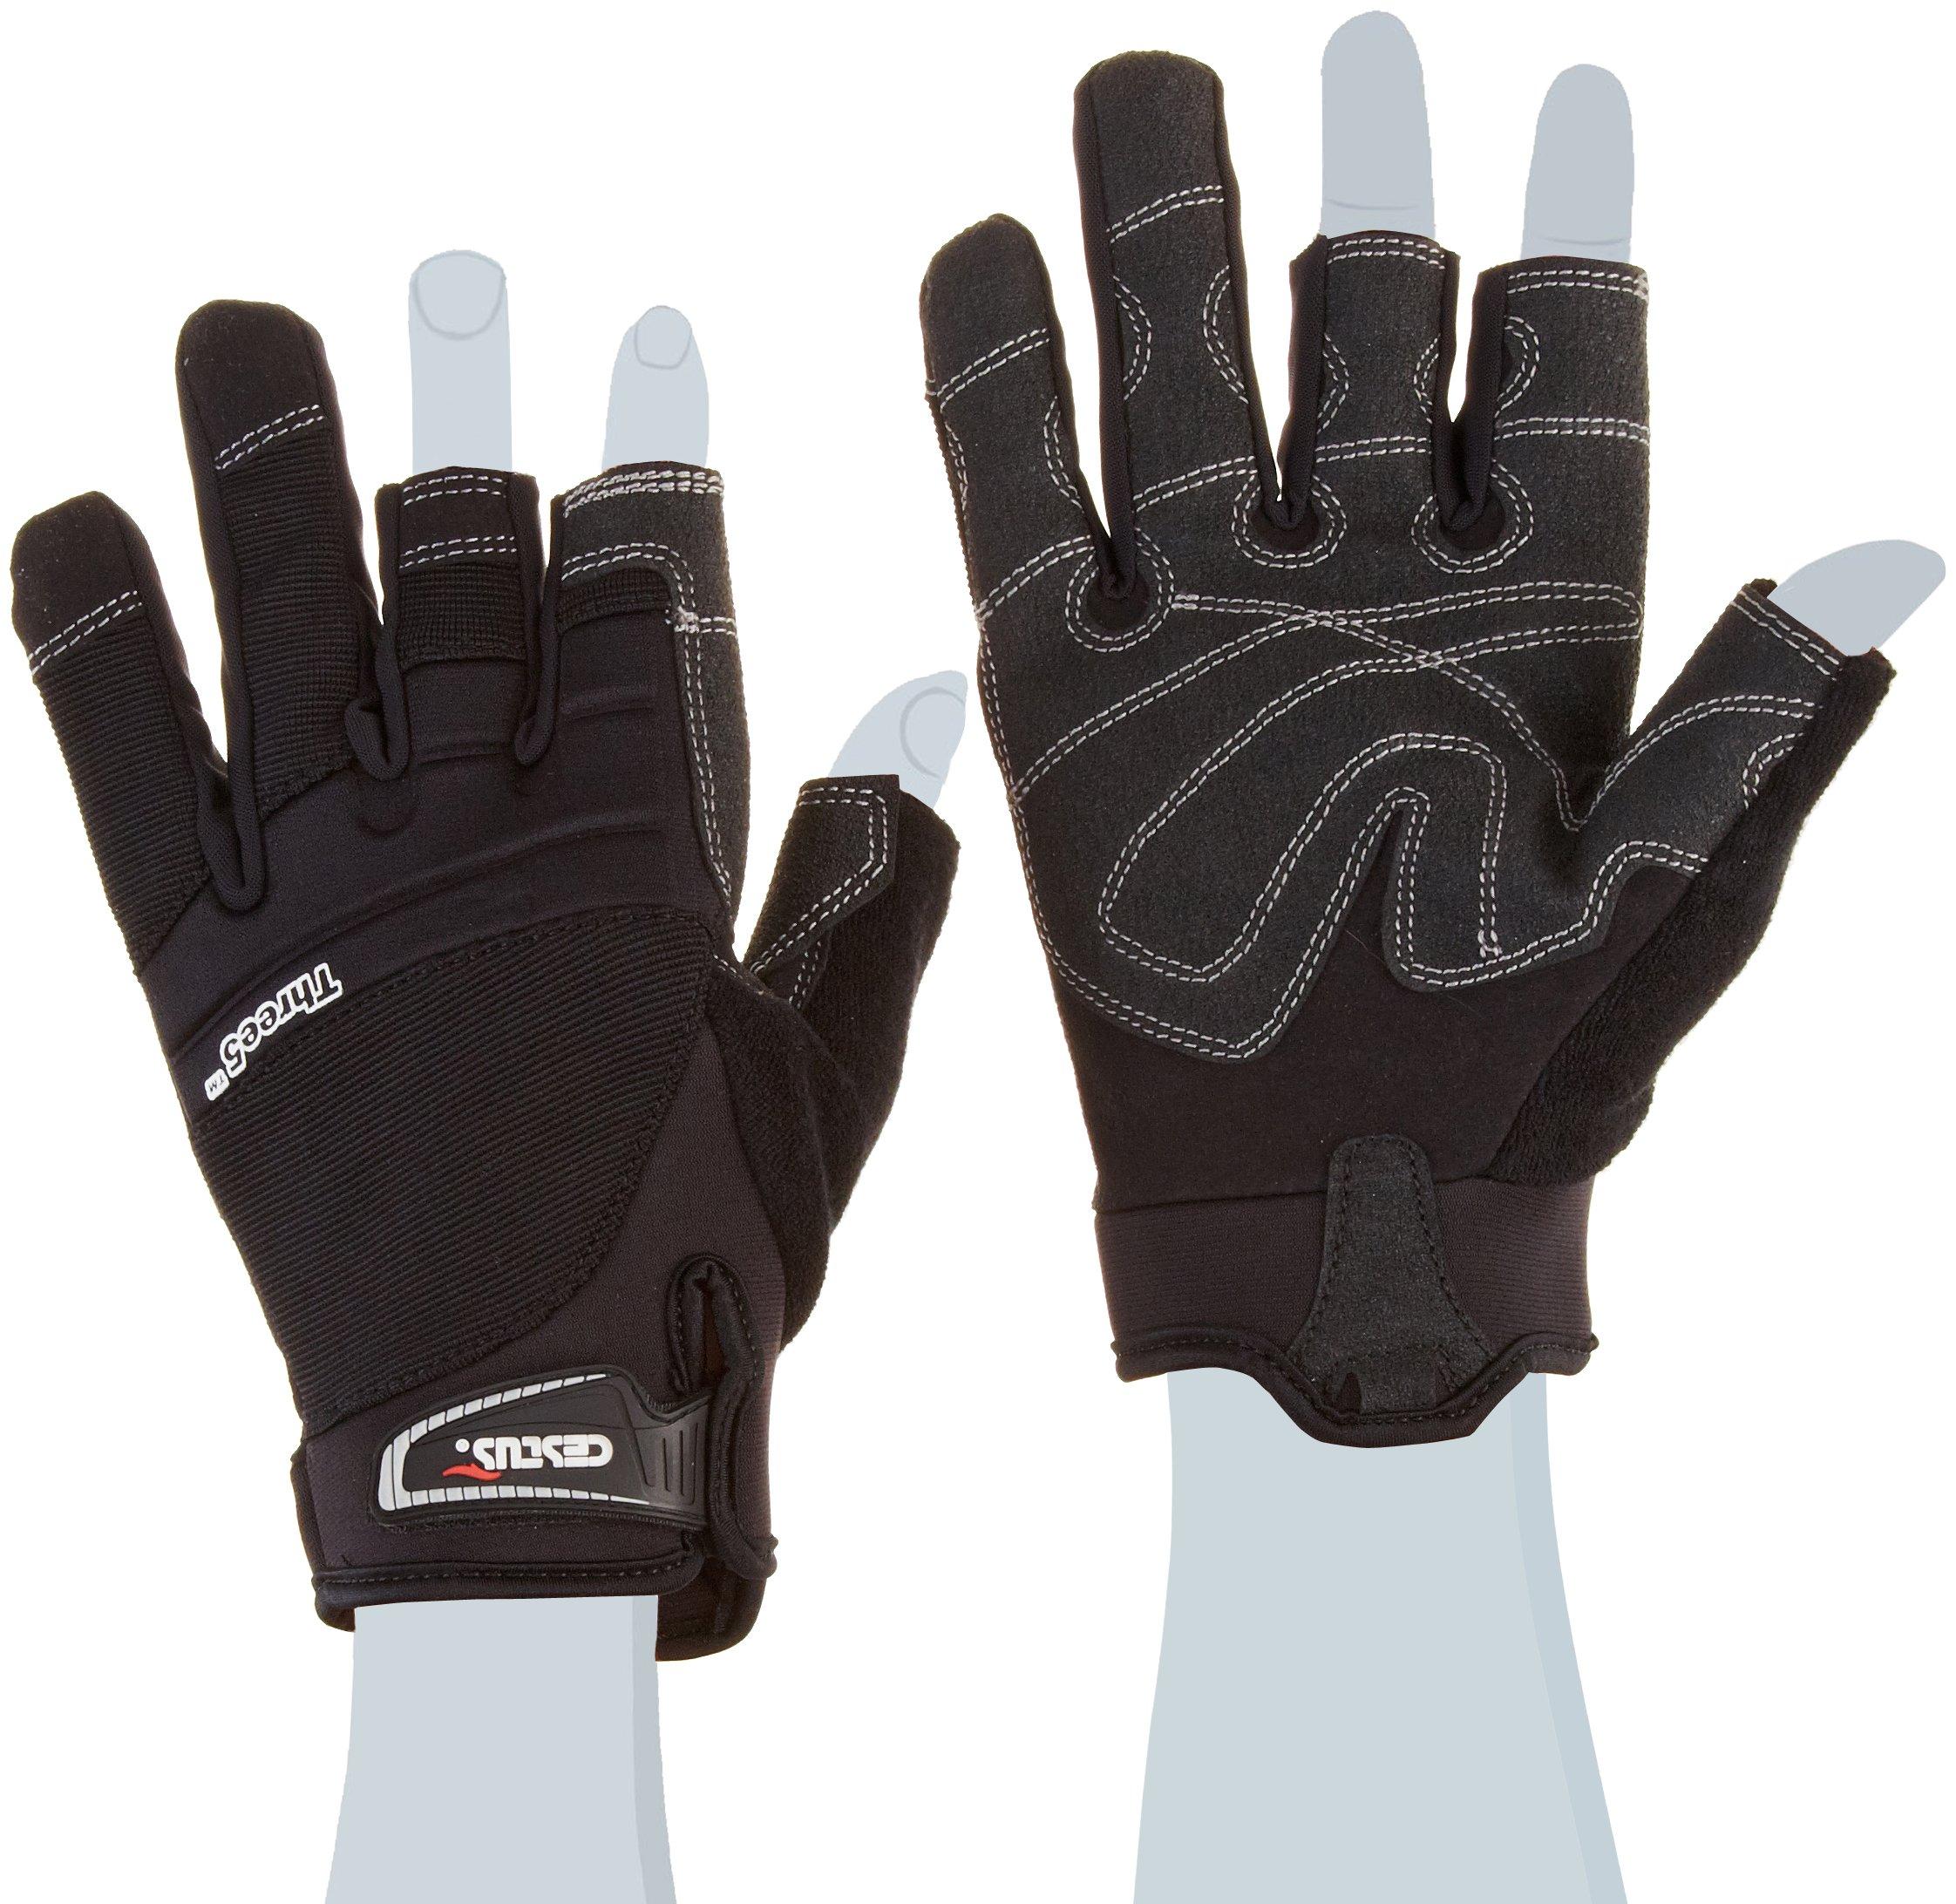 Cestus Trade Series Three5 Framing Glove, Work, Cut Resistant, Large, Black (Pack of 1 Pair)